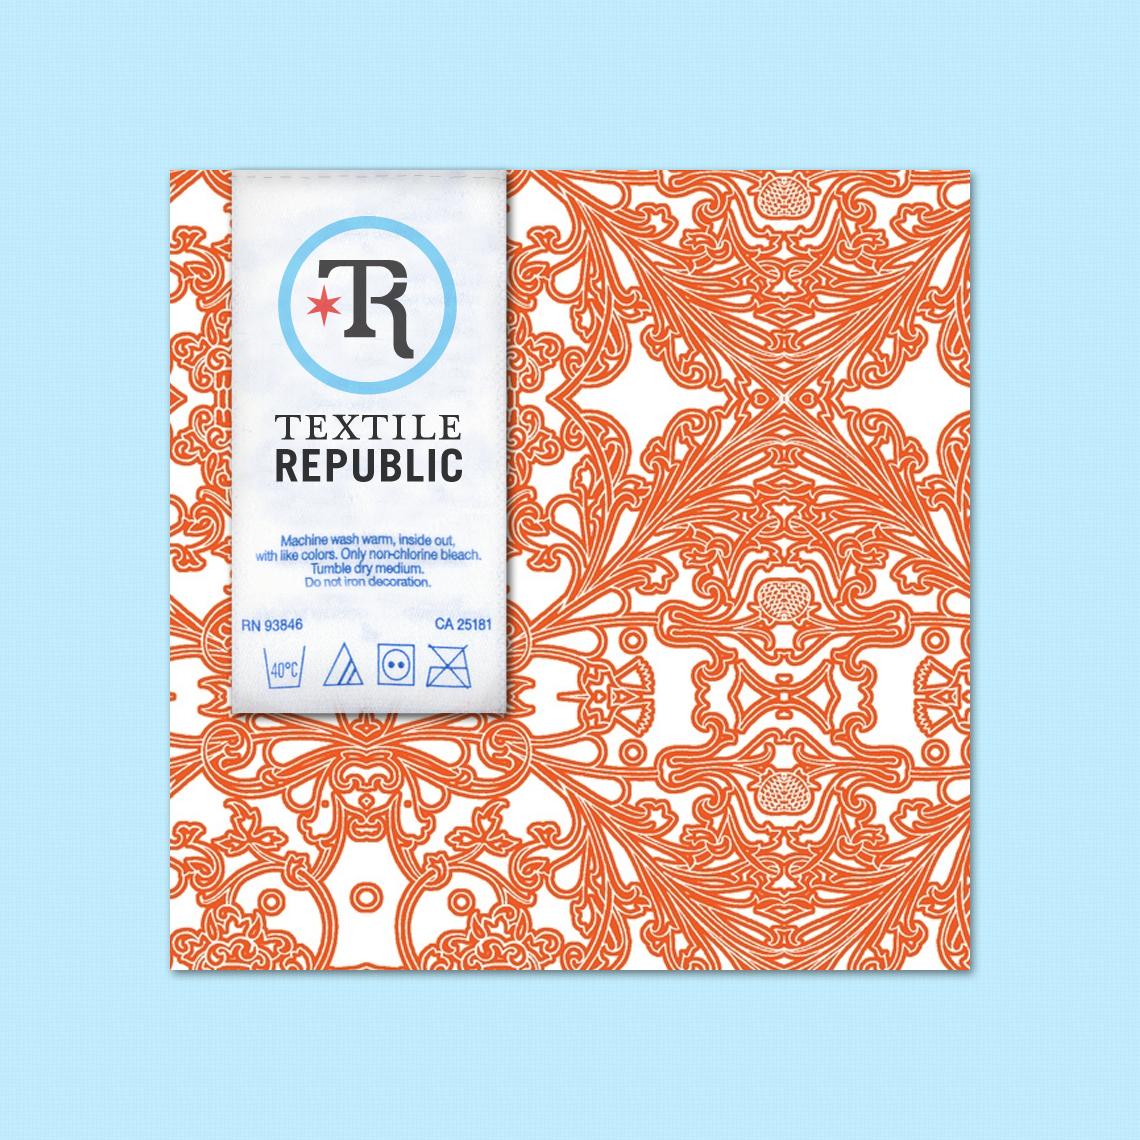 Textile Republic Branding